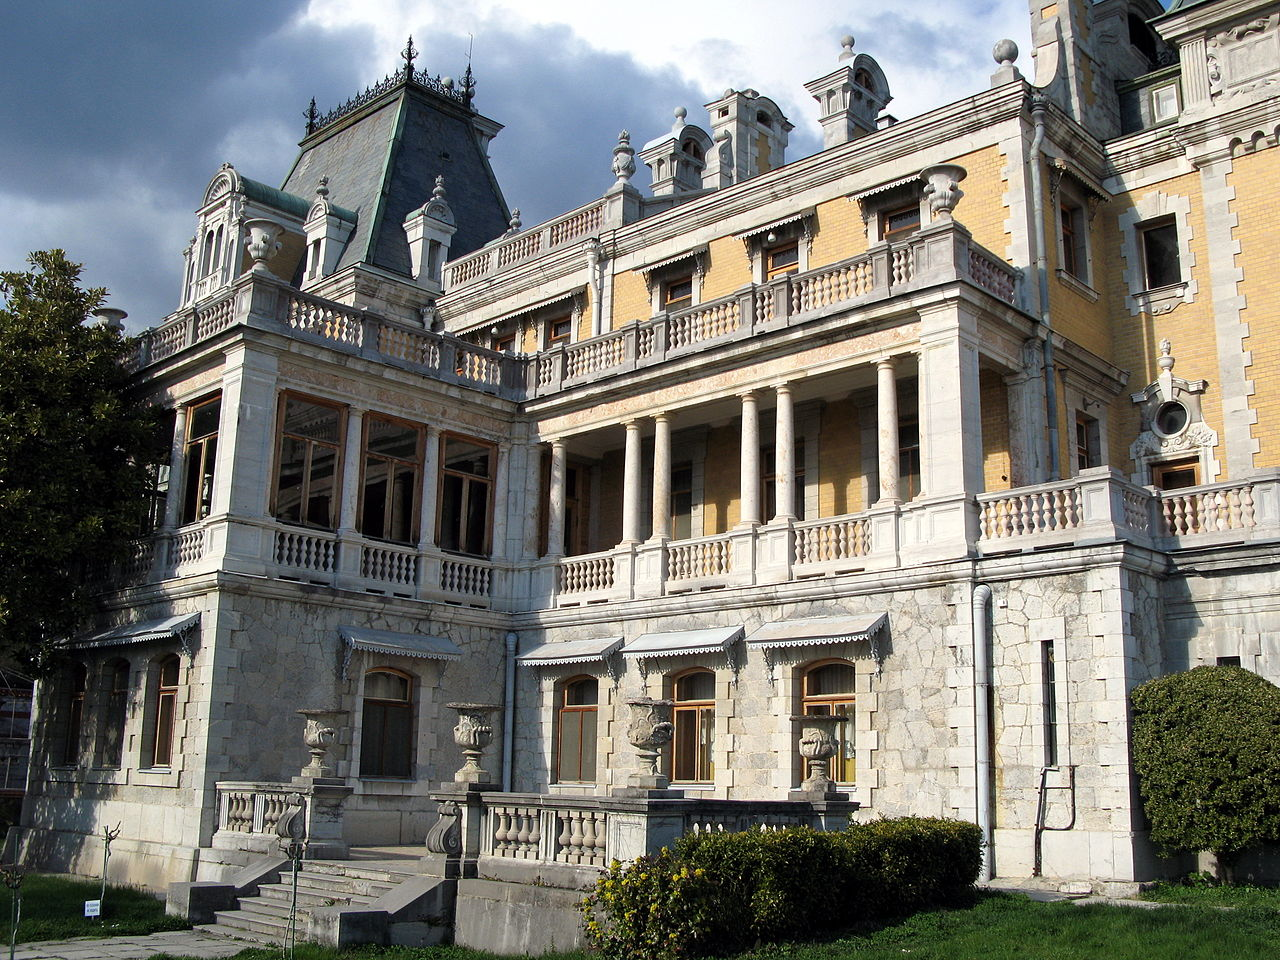 Массандровский дворец, крыльцо